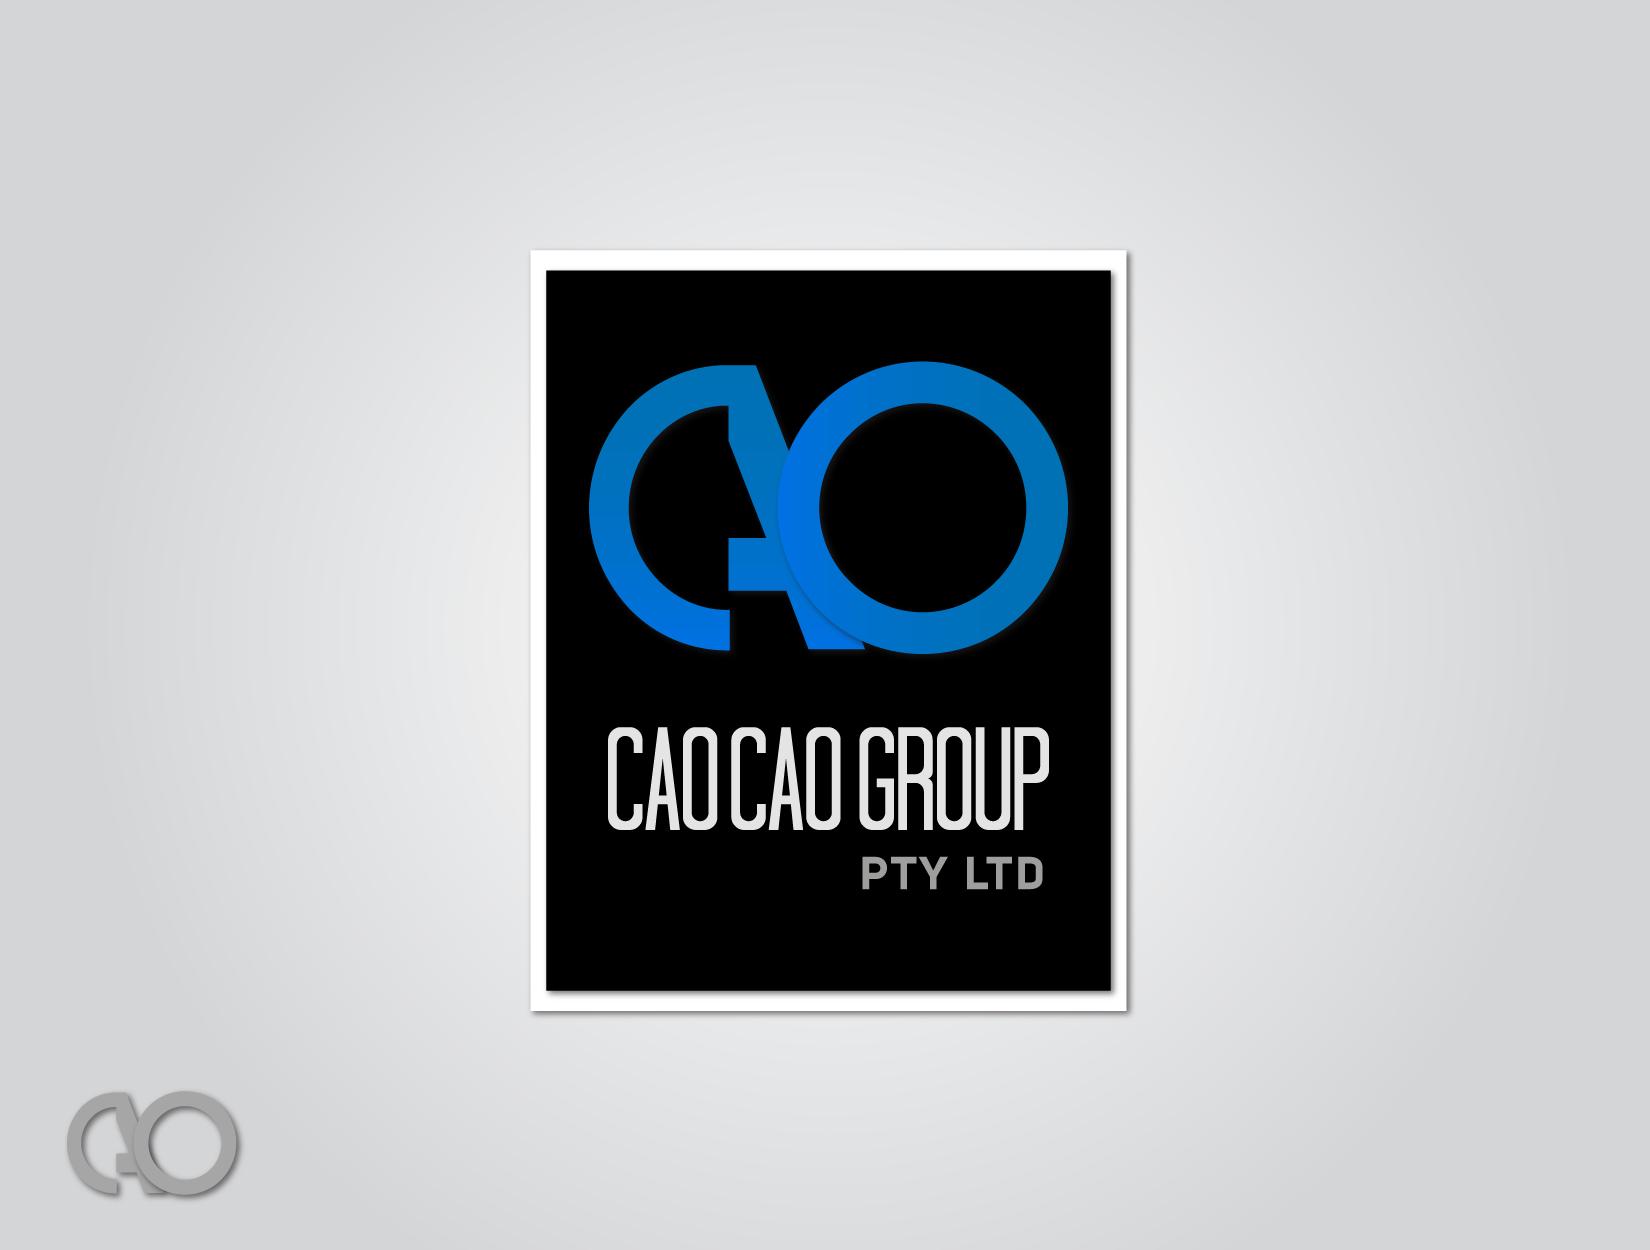 Logo Design by funkeekhan - Entry No. 163 in the Logo Design Contest cao cao group pty ltd Logo Design.